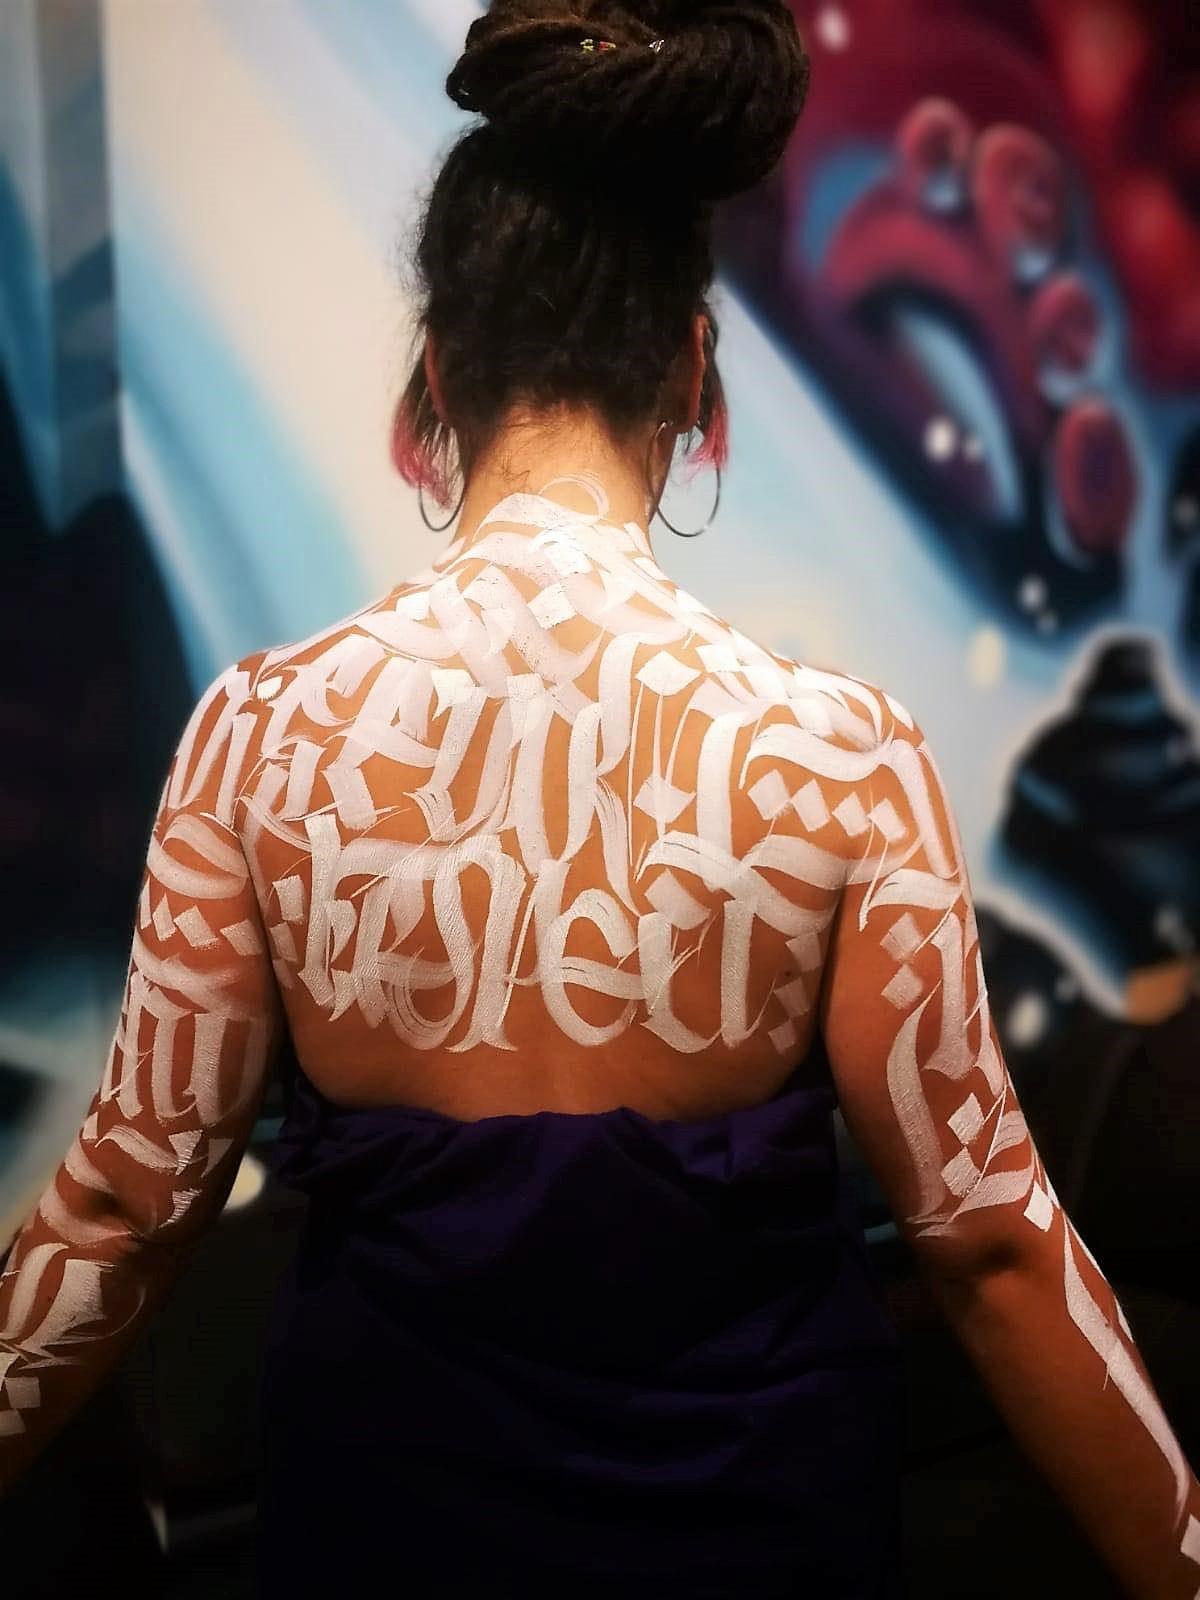 MR ZE caligraffiti palencia caligrafía artística san antolin infame